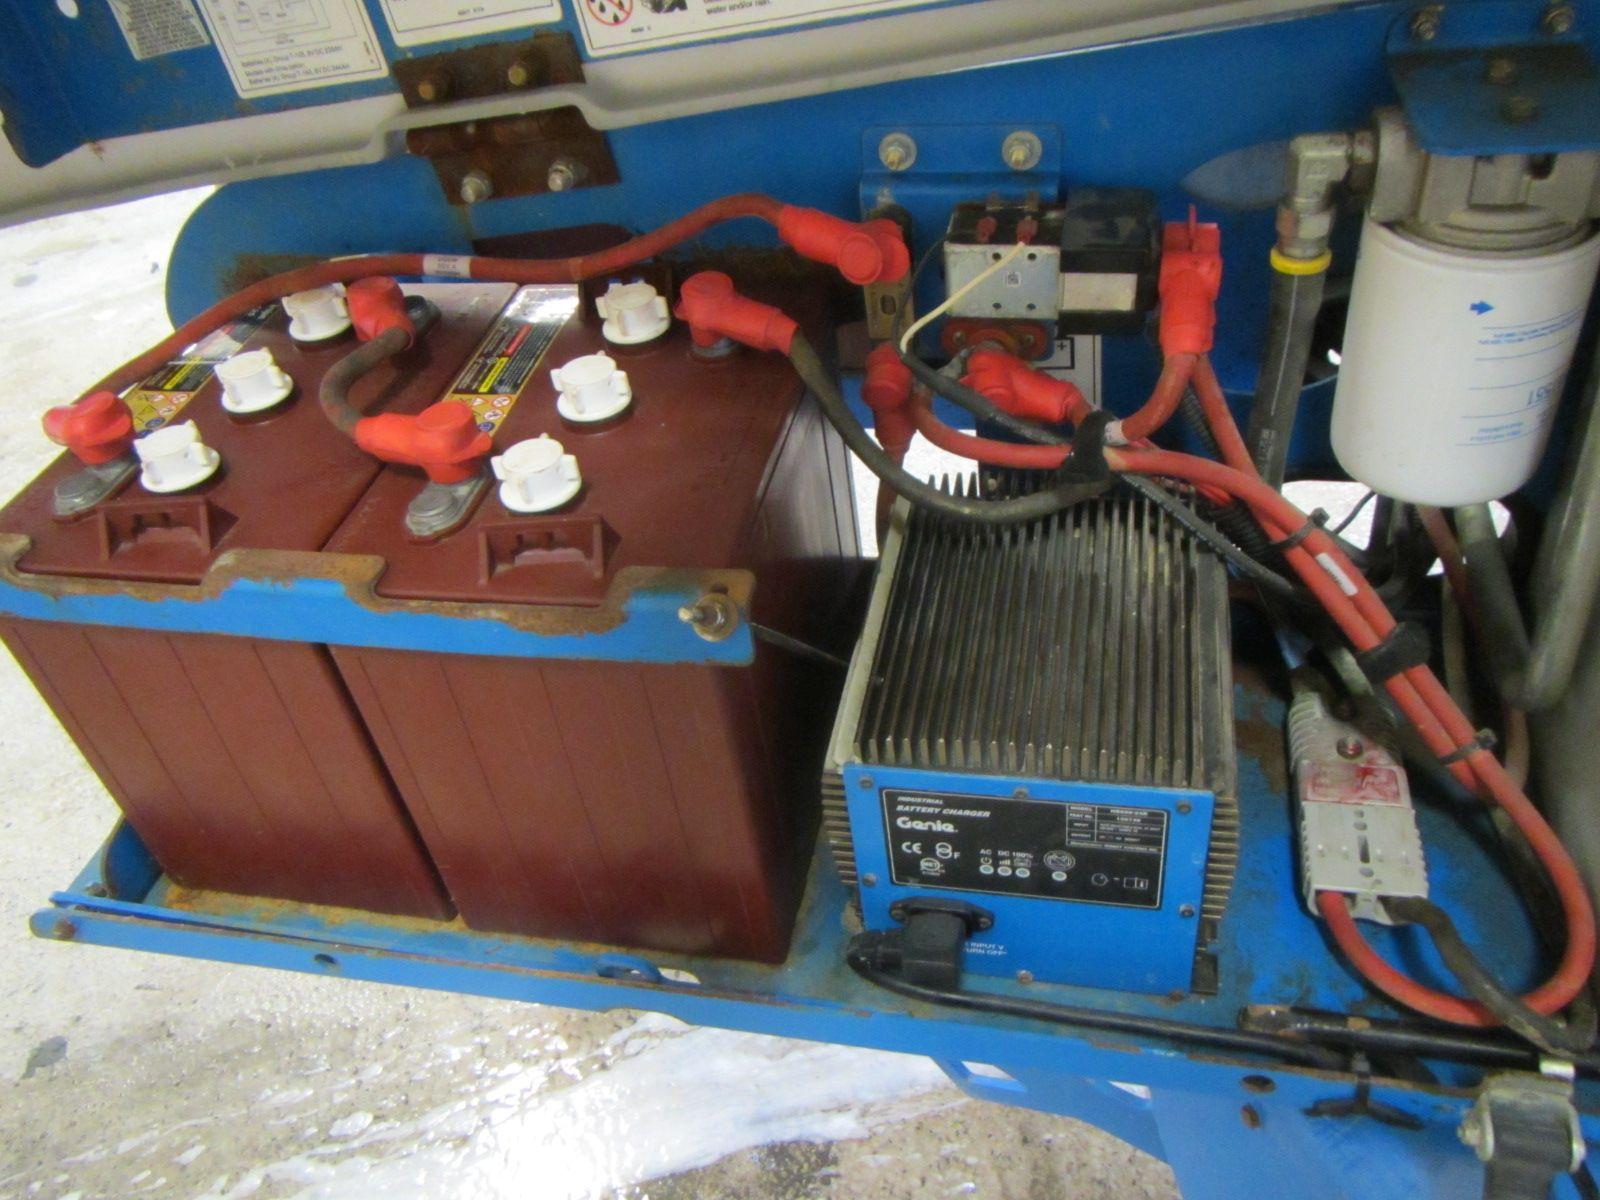 Genie Intellicode Wiring Diagram Question About S60 Parts Garage Door Opener